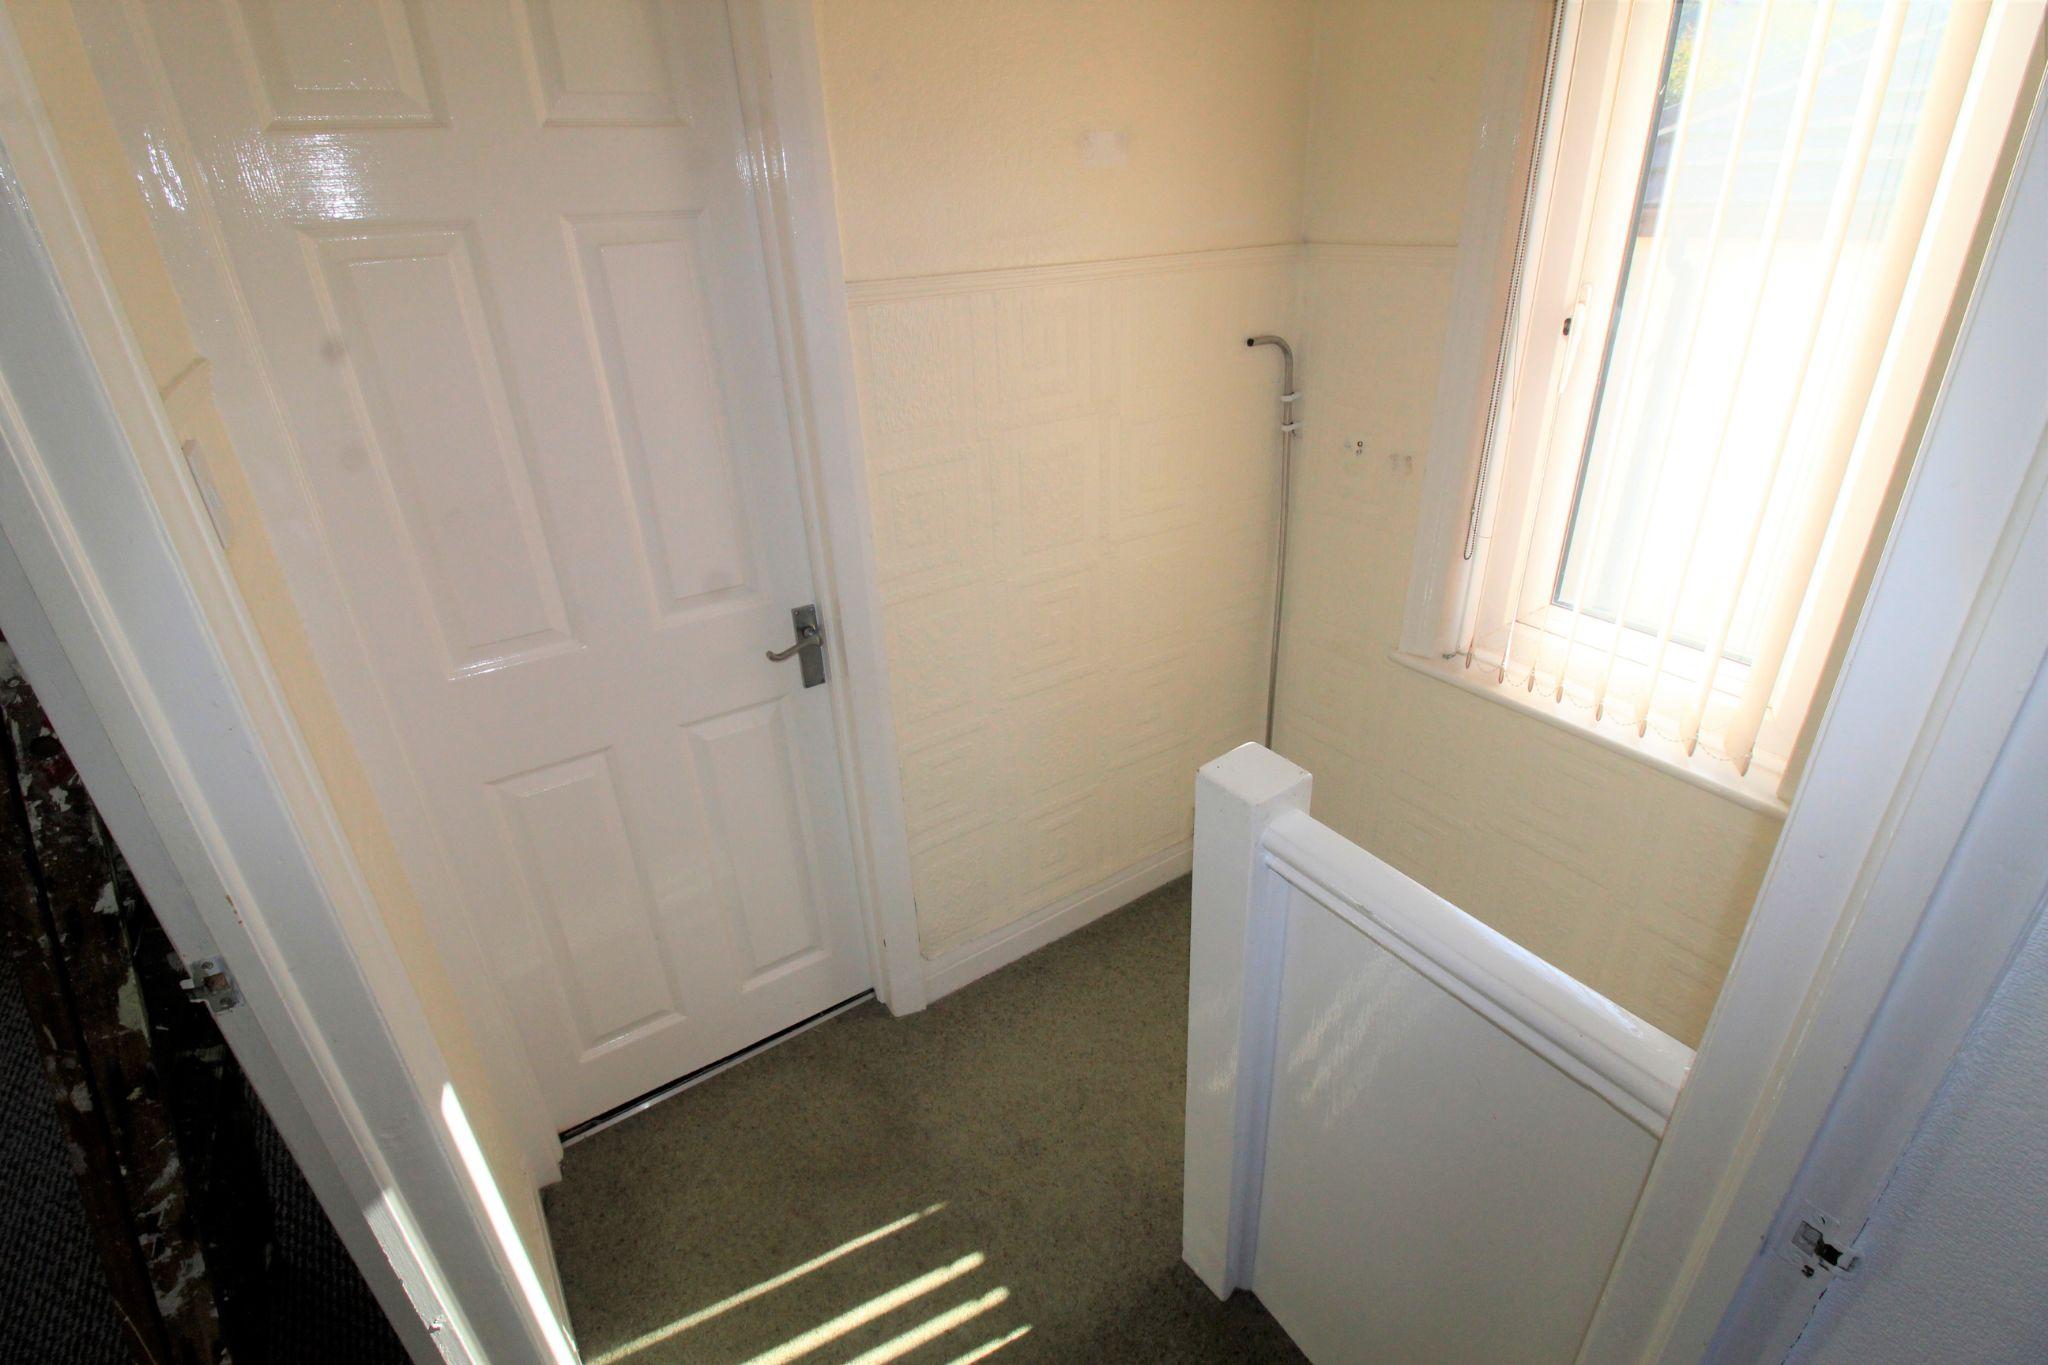 2 bedroom semi-detached house Let in Bradford - Landing